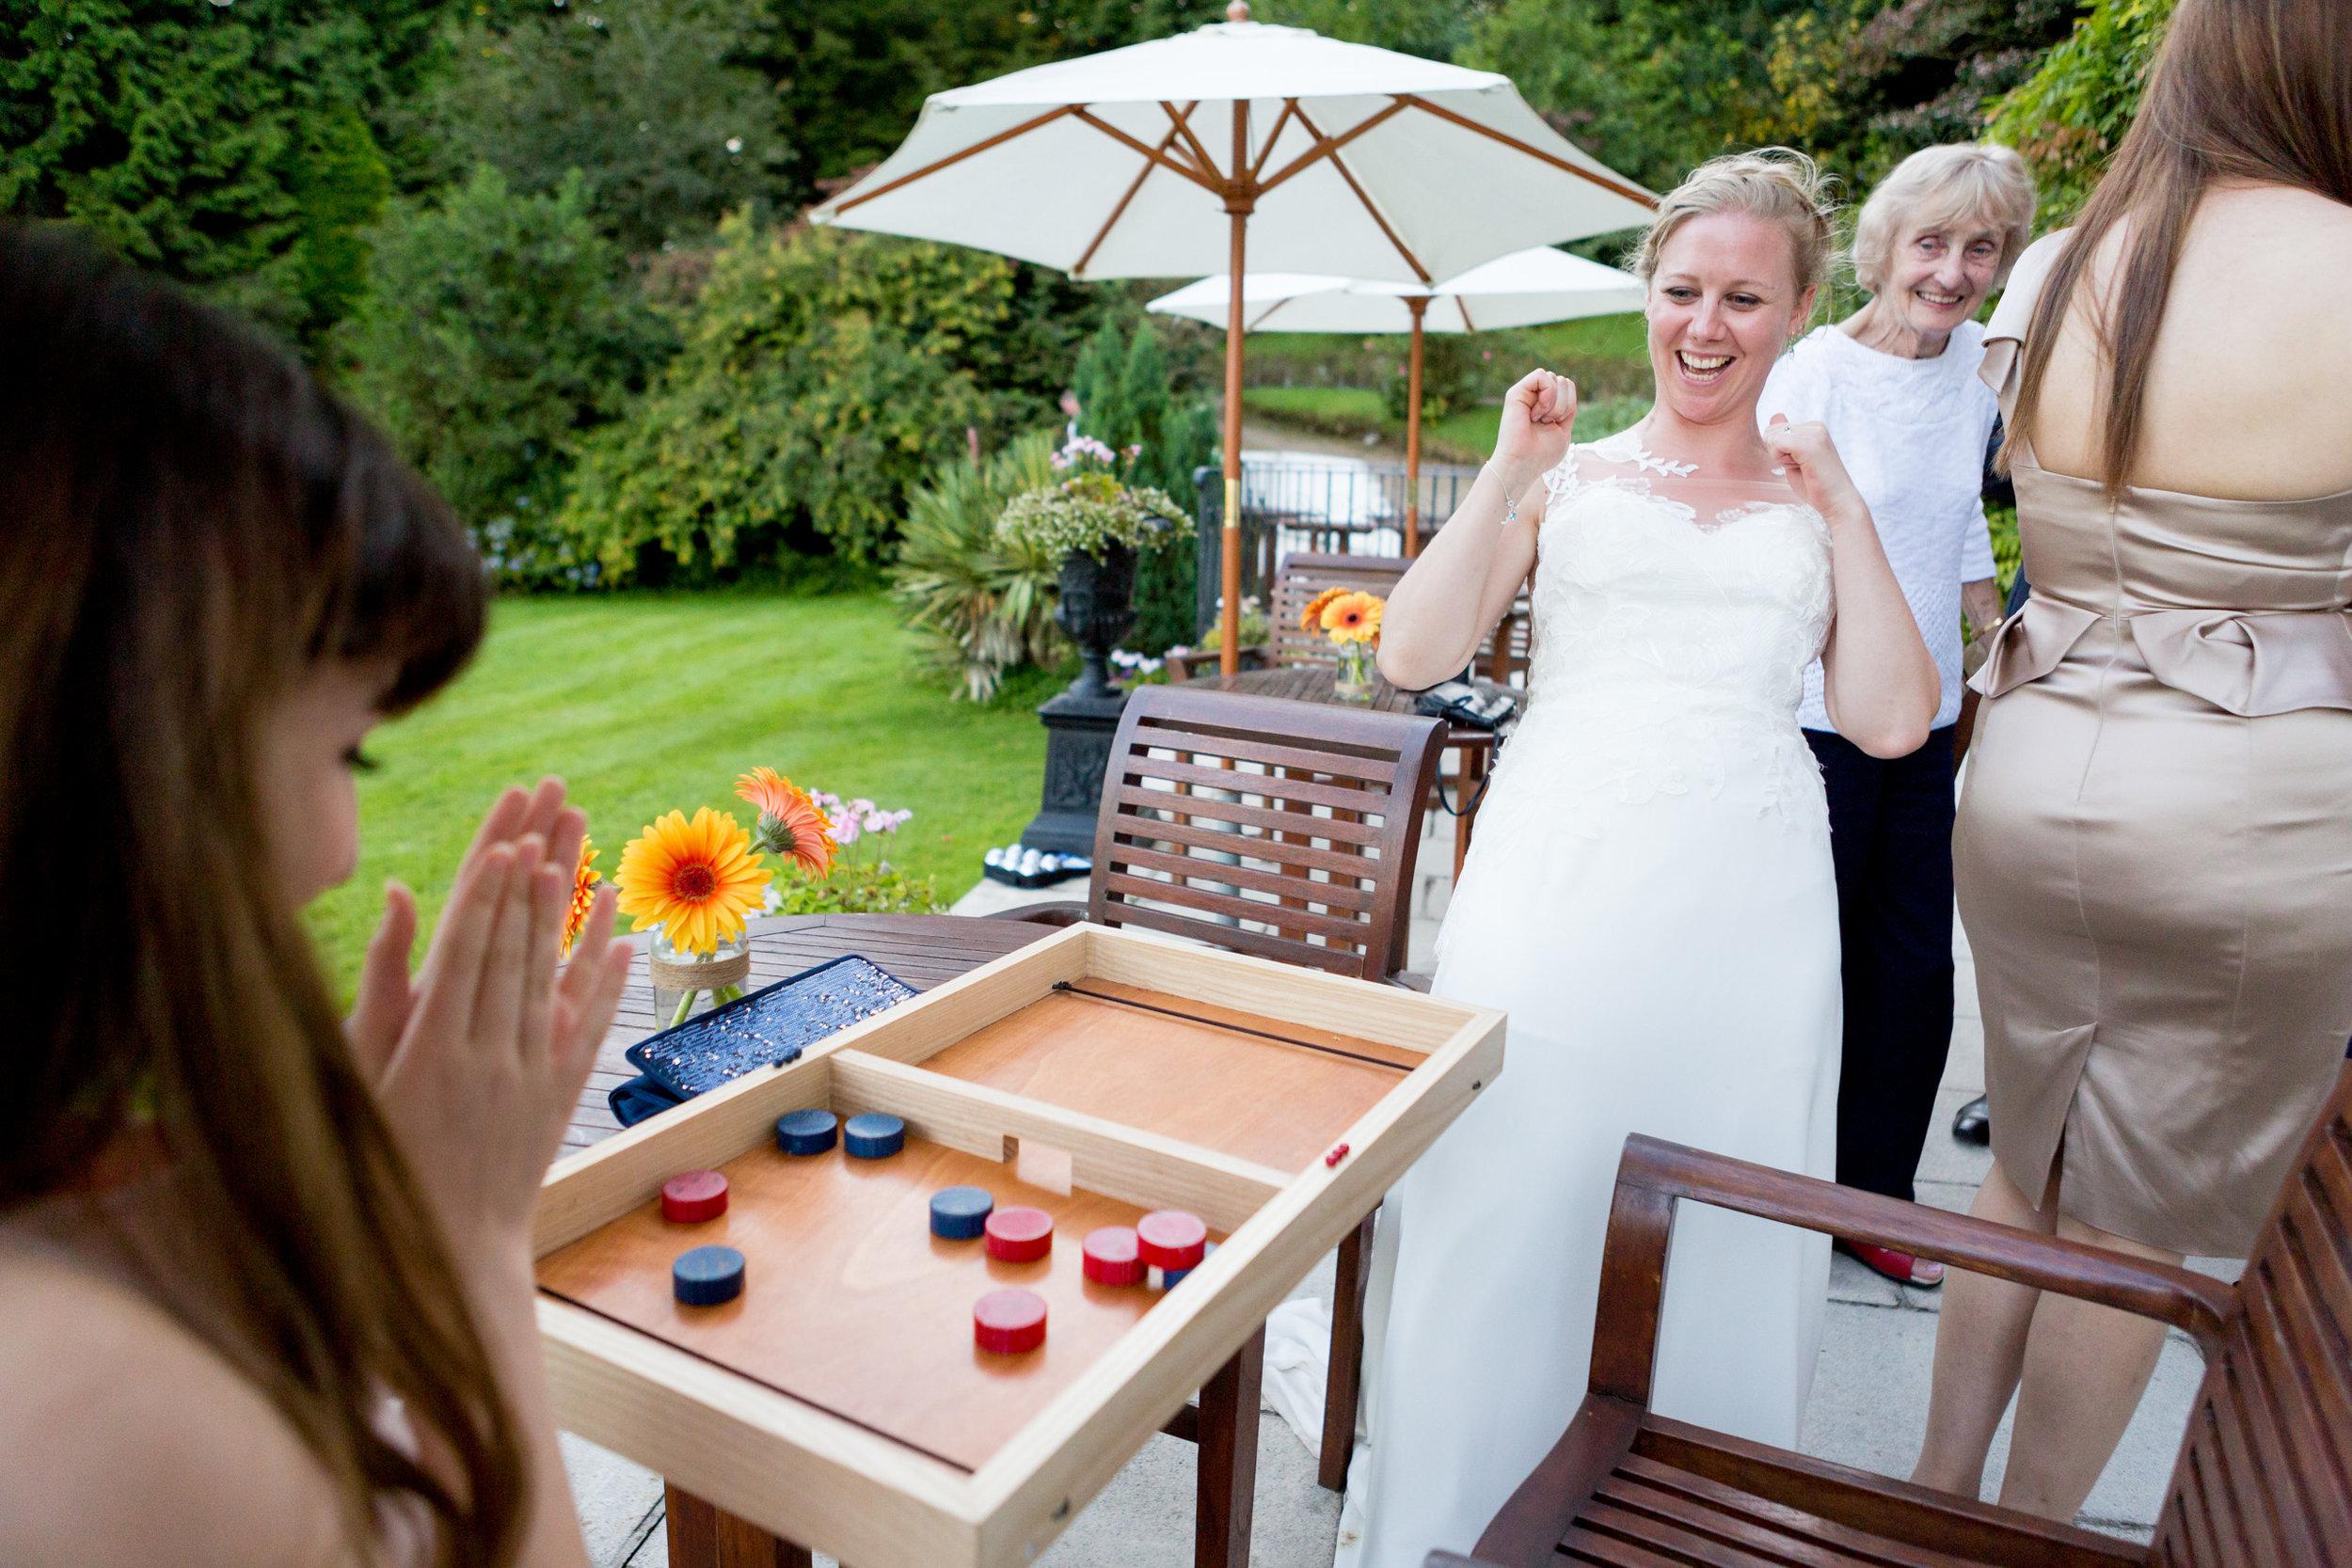 Bucklands-Tout-Saints-Hotel-Devon-Wedding-Photography-31.jpg